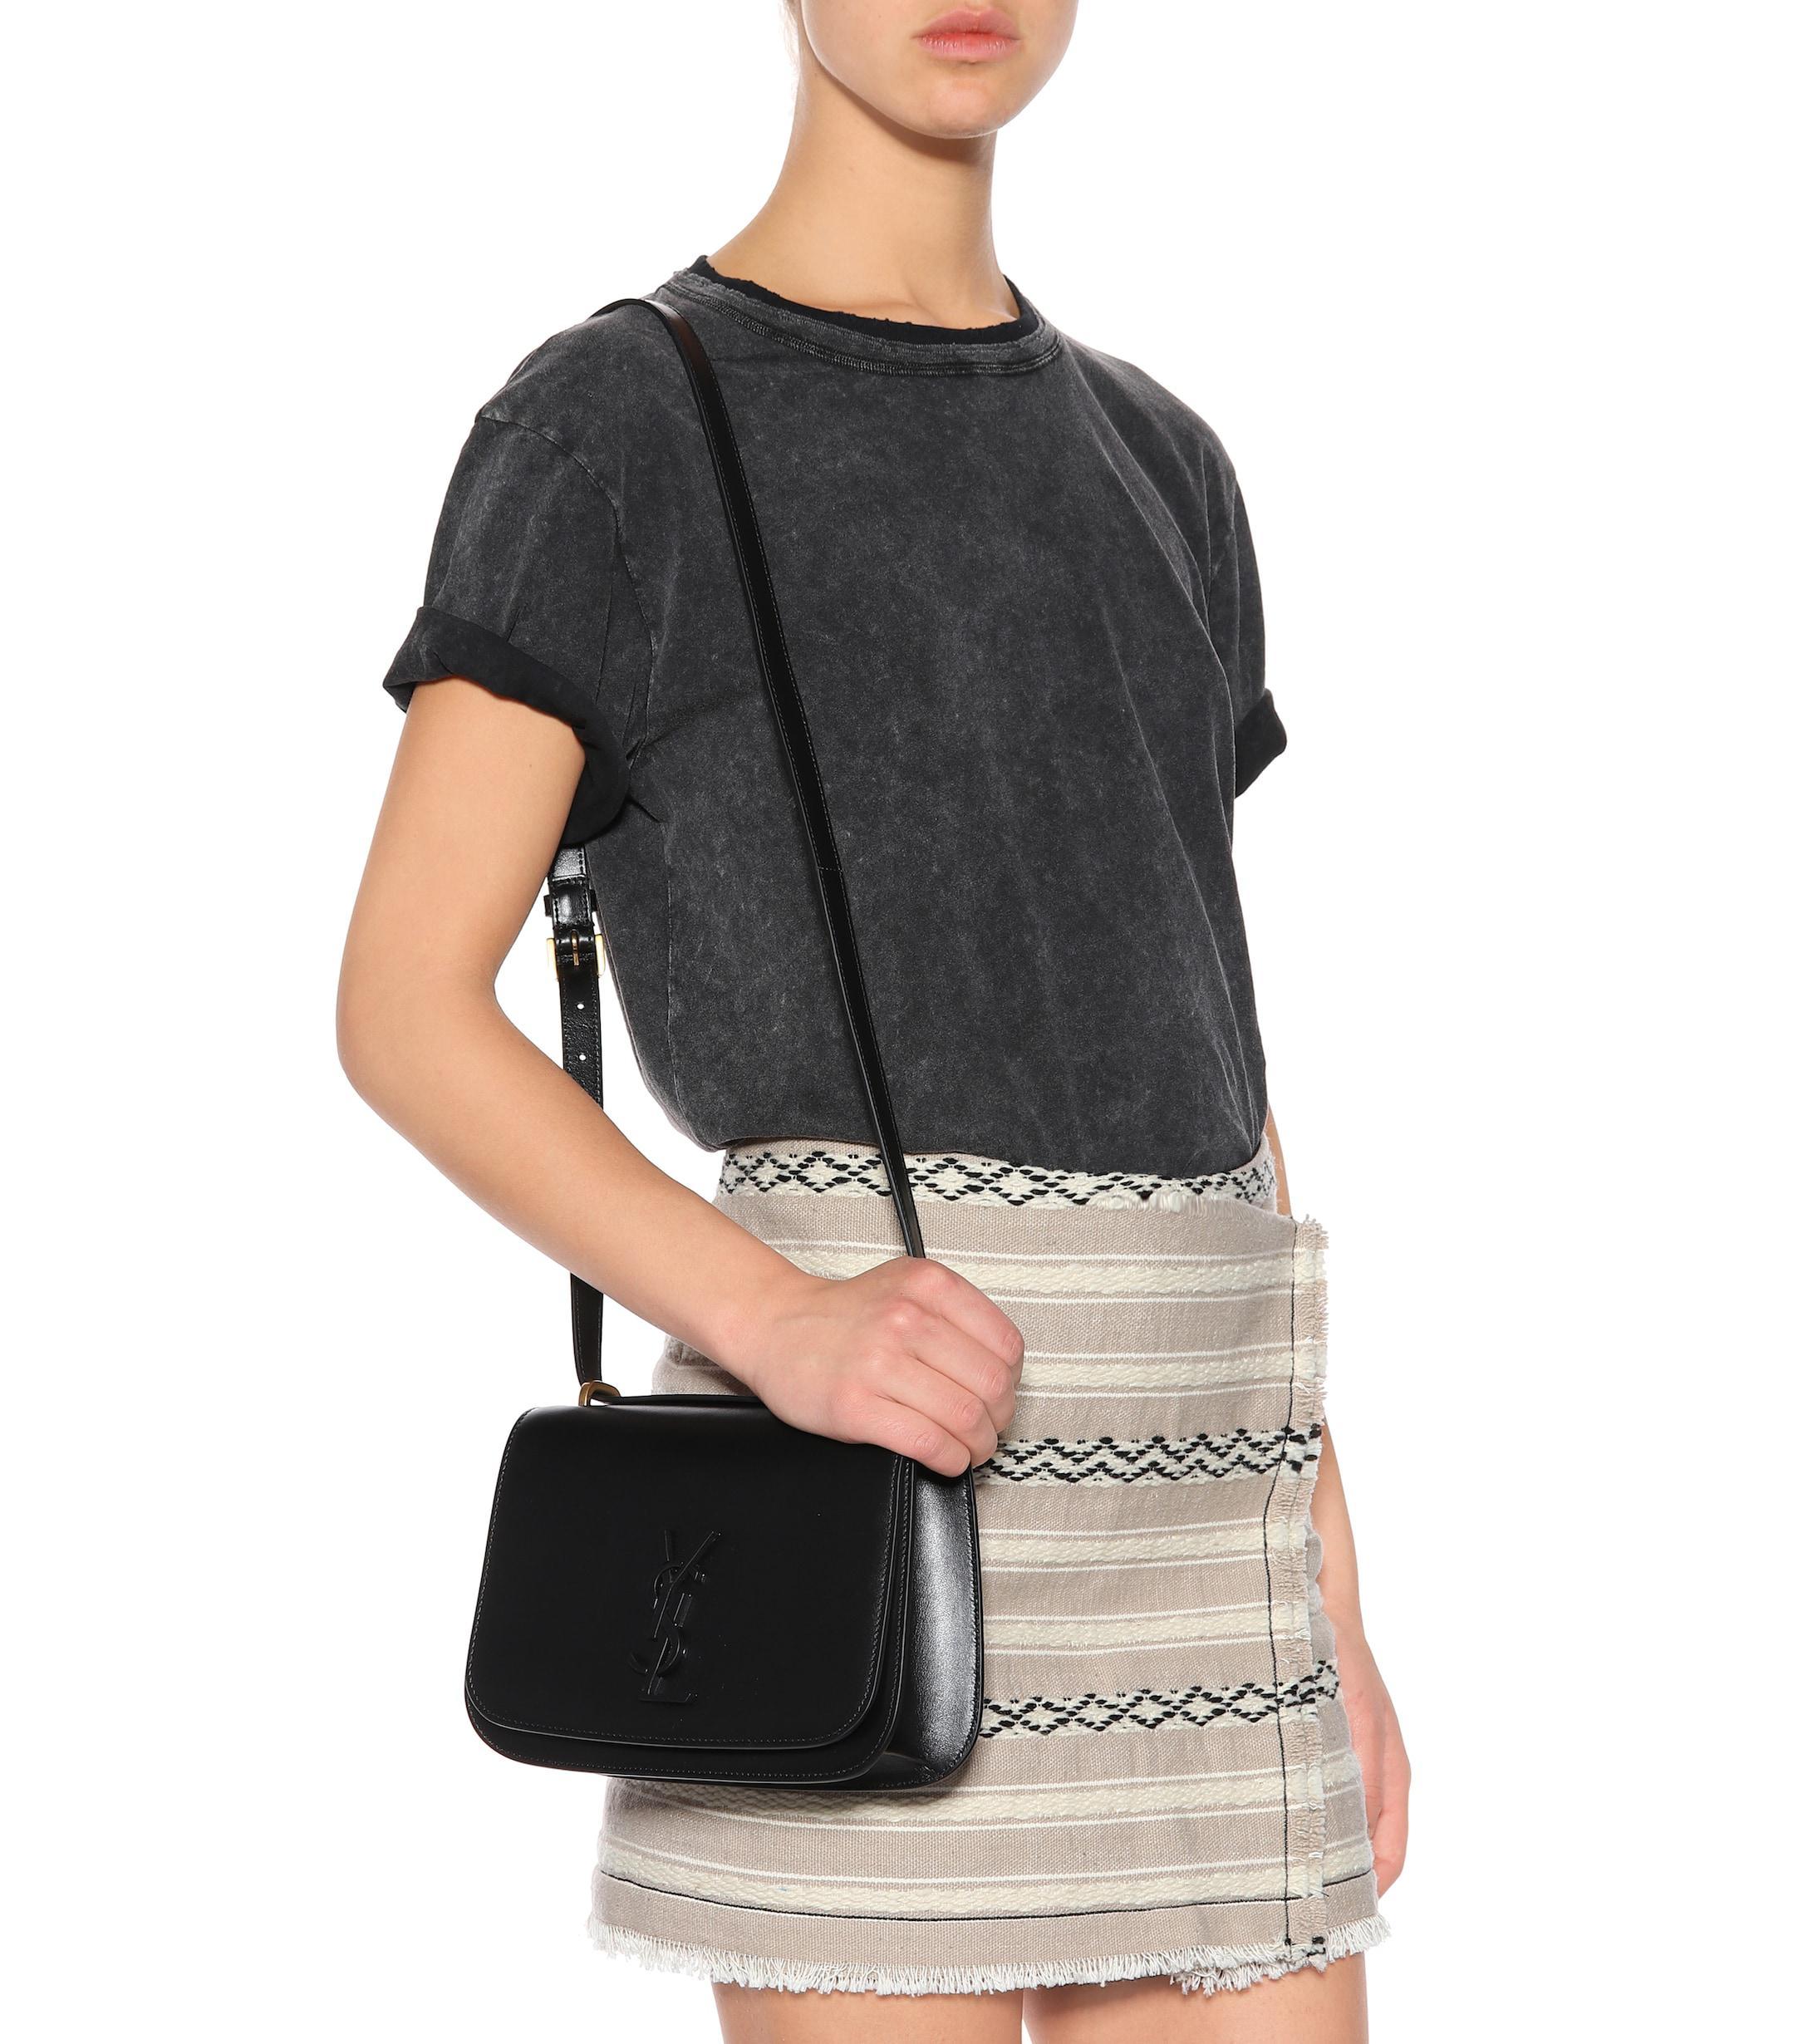 fda45381735 Saint Laurent Small Spontini Leather Shoulder Bag in Black - Lyst